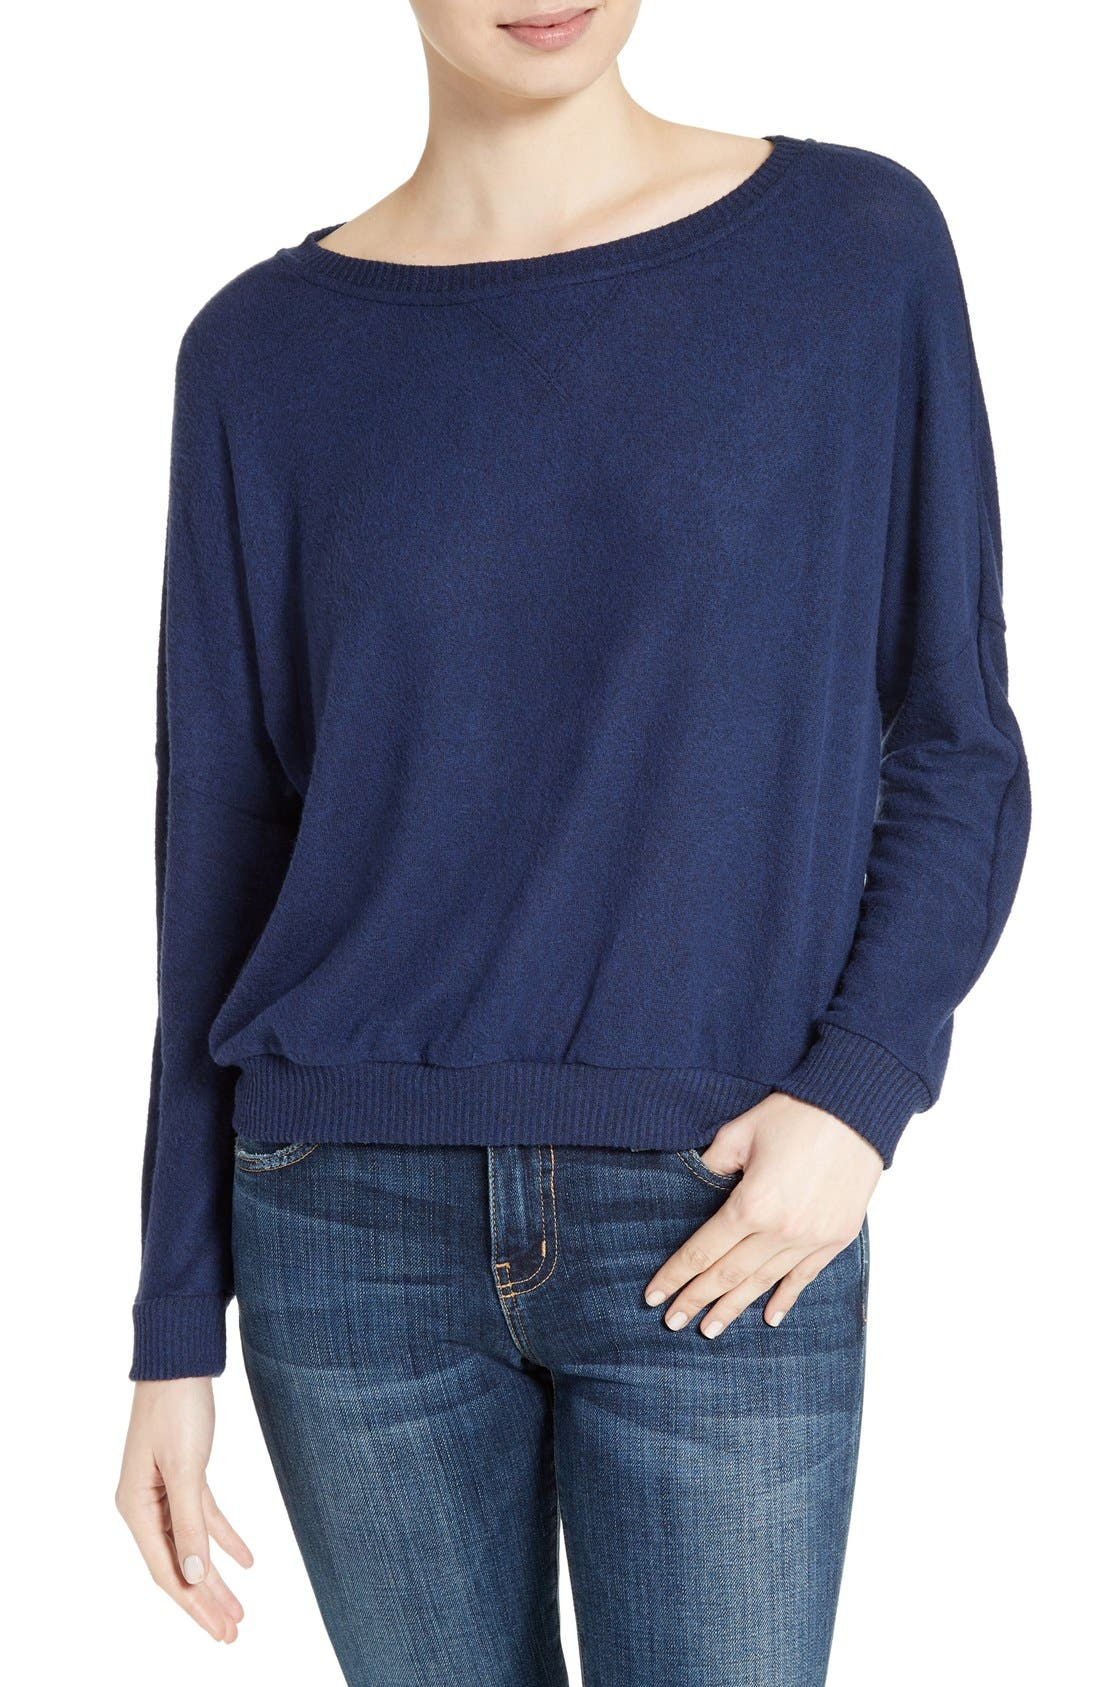 Soft Joie Giardia Drop Shoulder Sweater,                             Main thumbnail 1, color,                             Peacoat